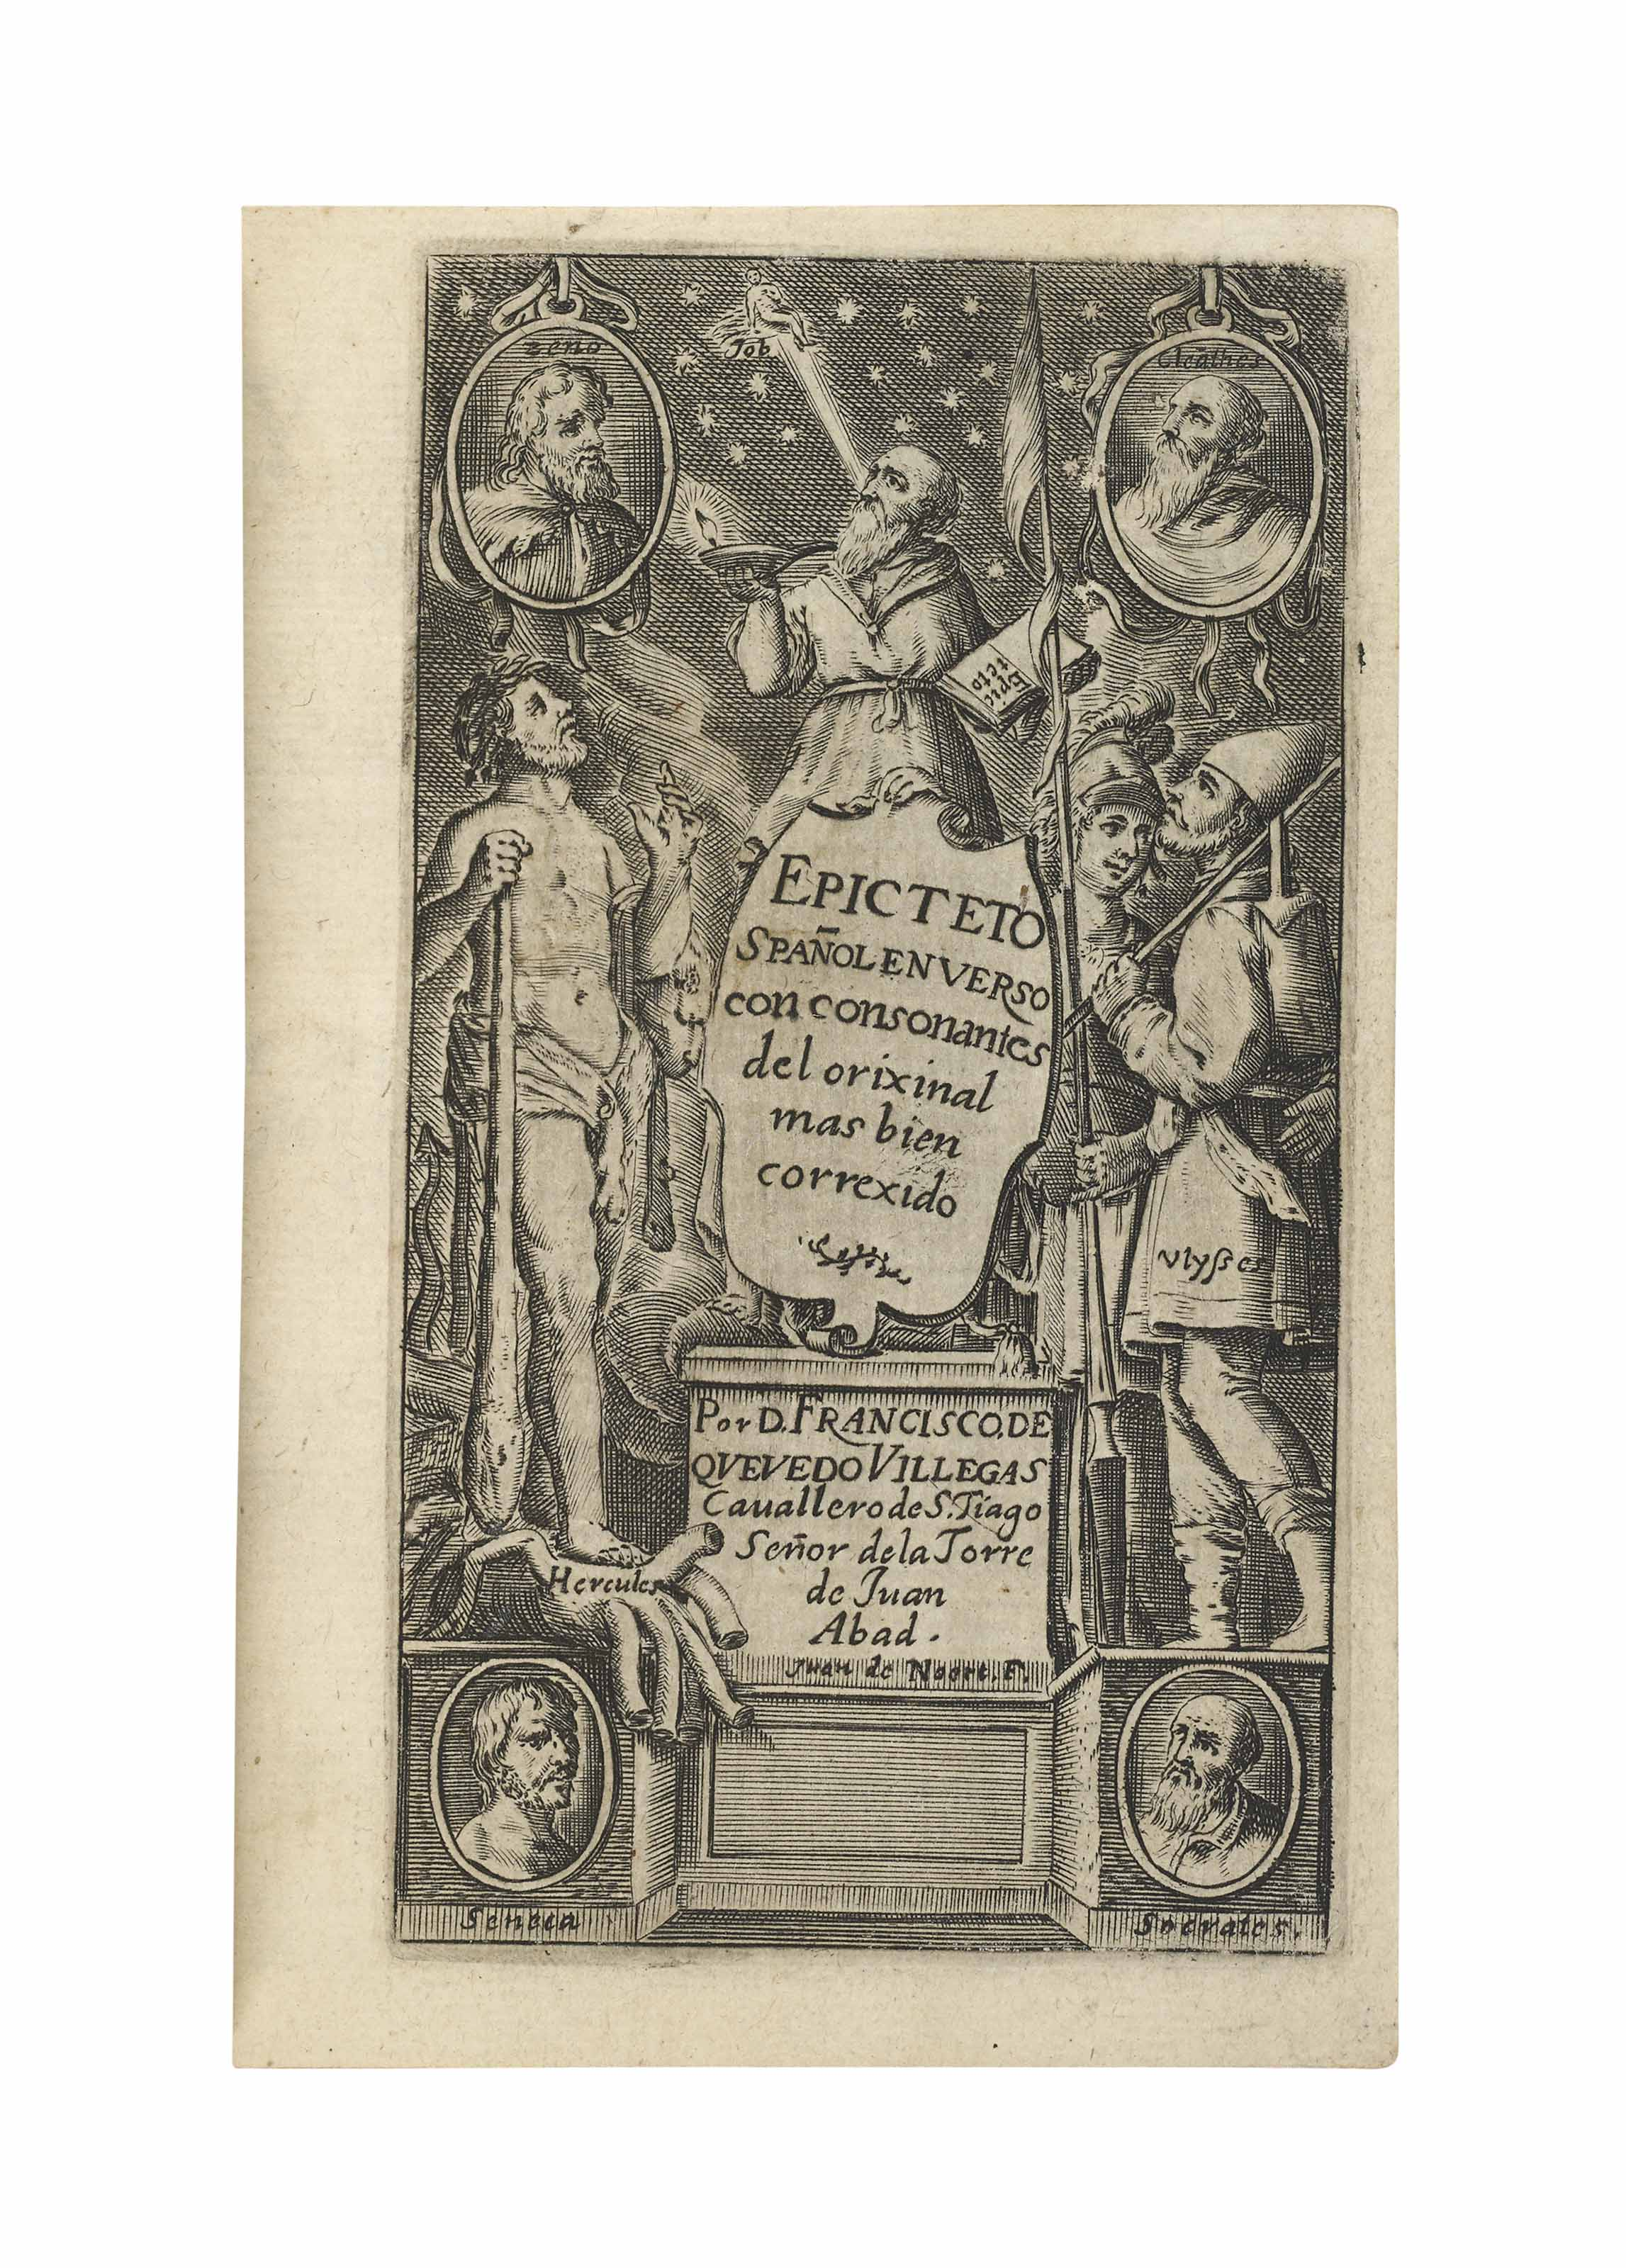 EPICTETUS (c. AD 60-140). Doct